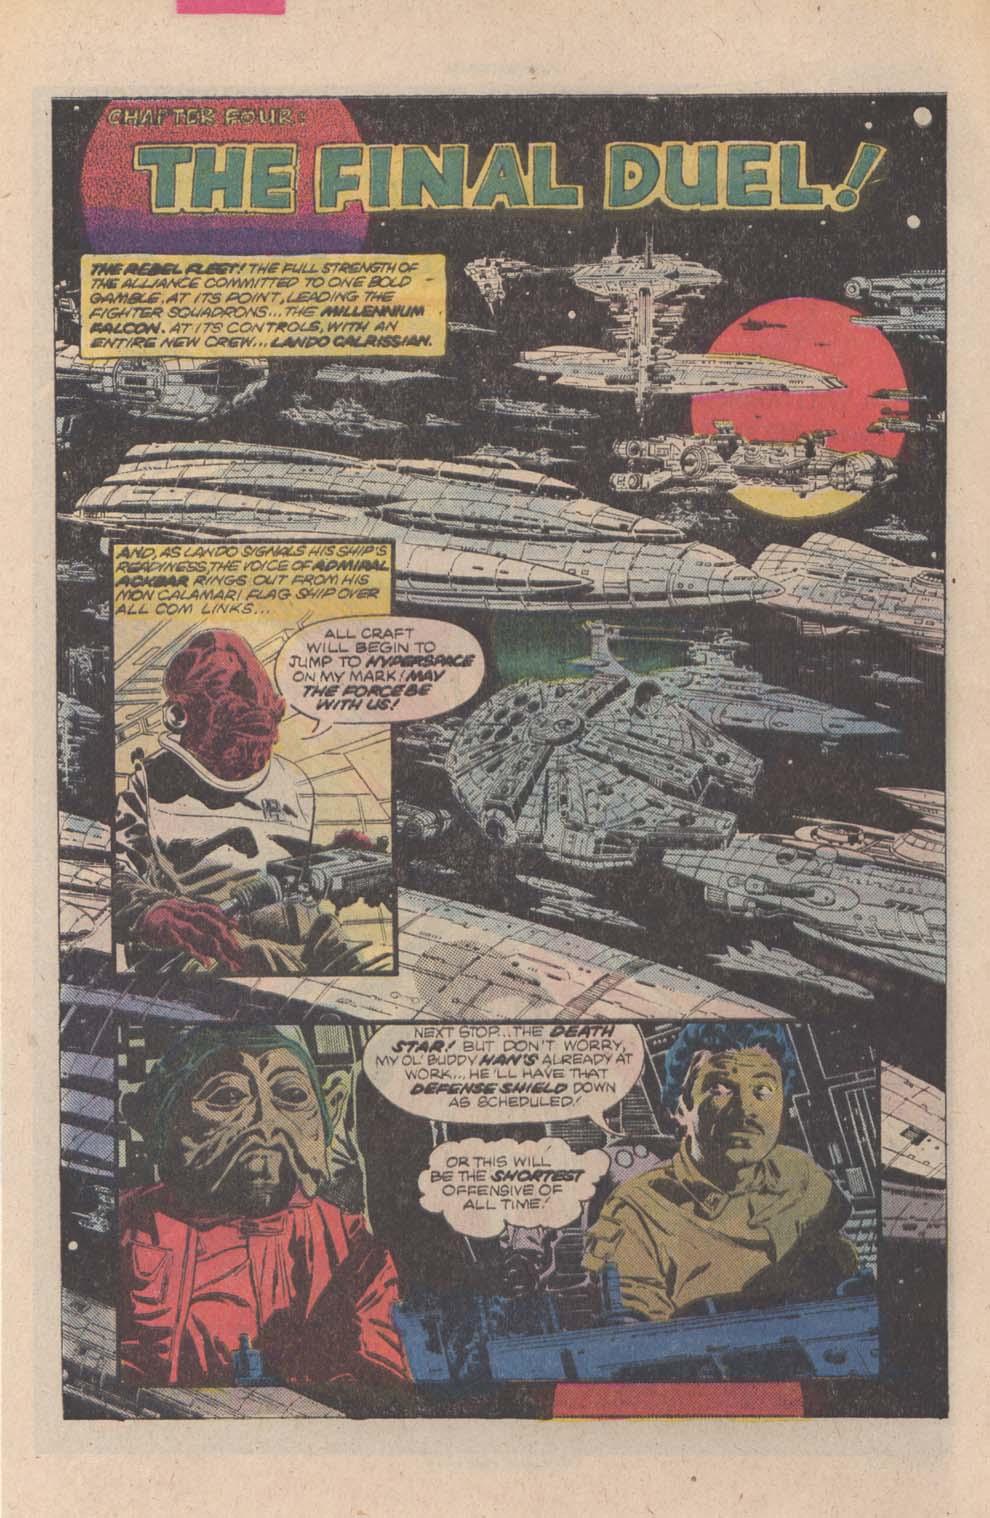 Read online Star Wars: Return of the Jedi comic -  Issue #4 - 4